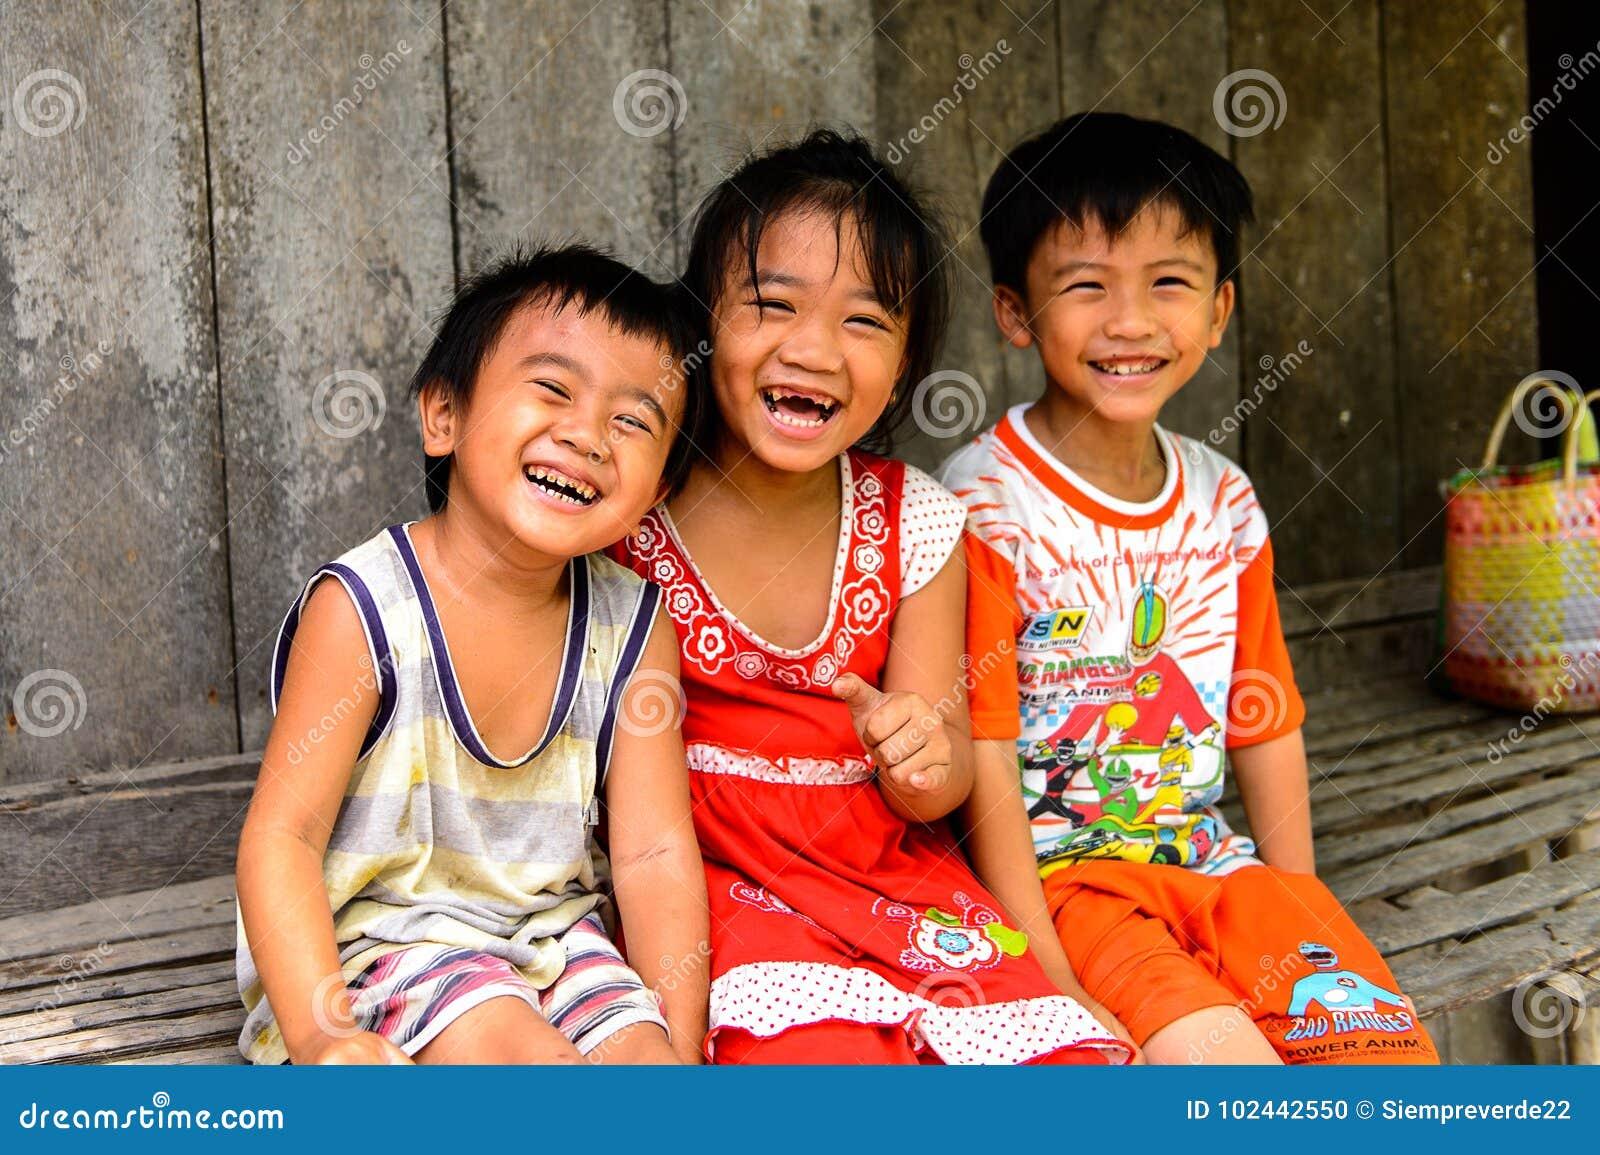 Vietnamese children editorial image  Image of effect - 102442550